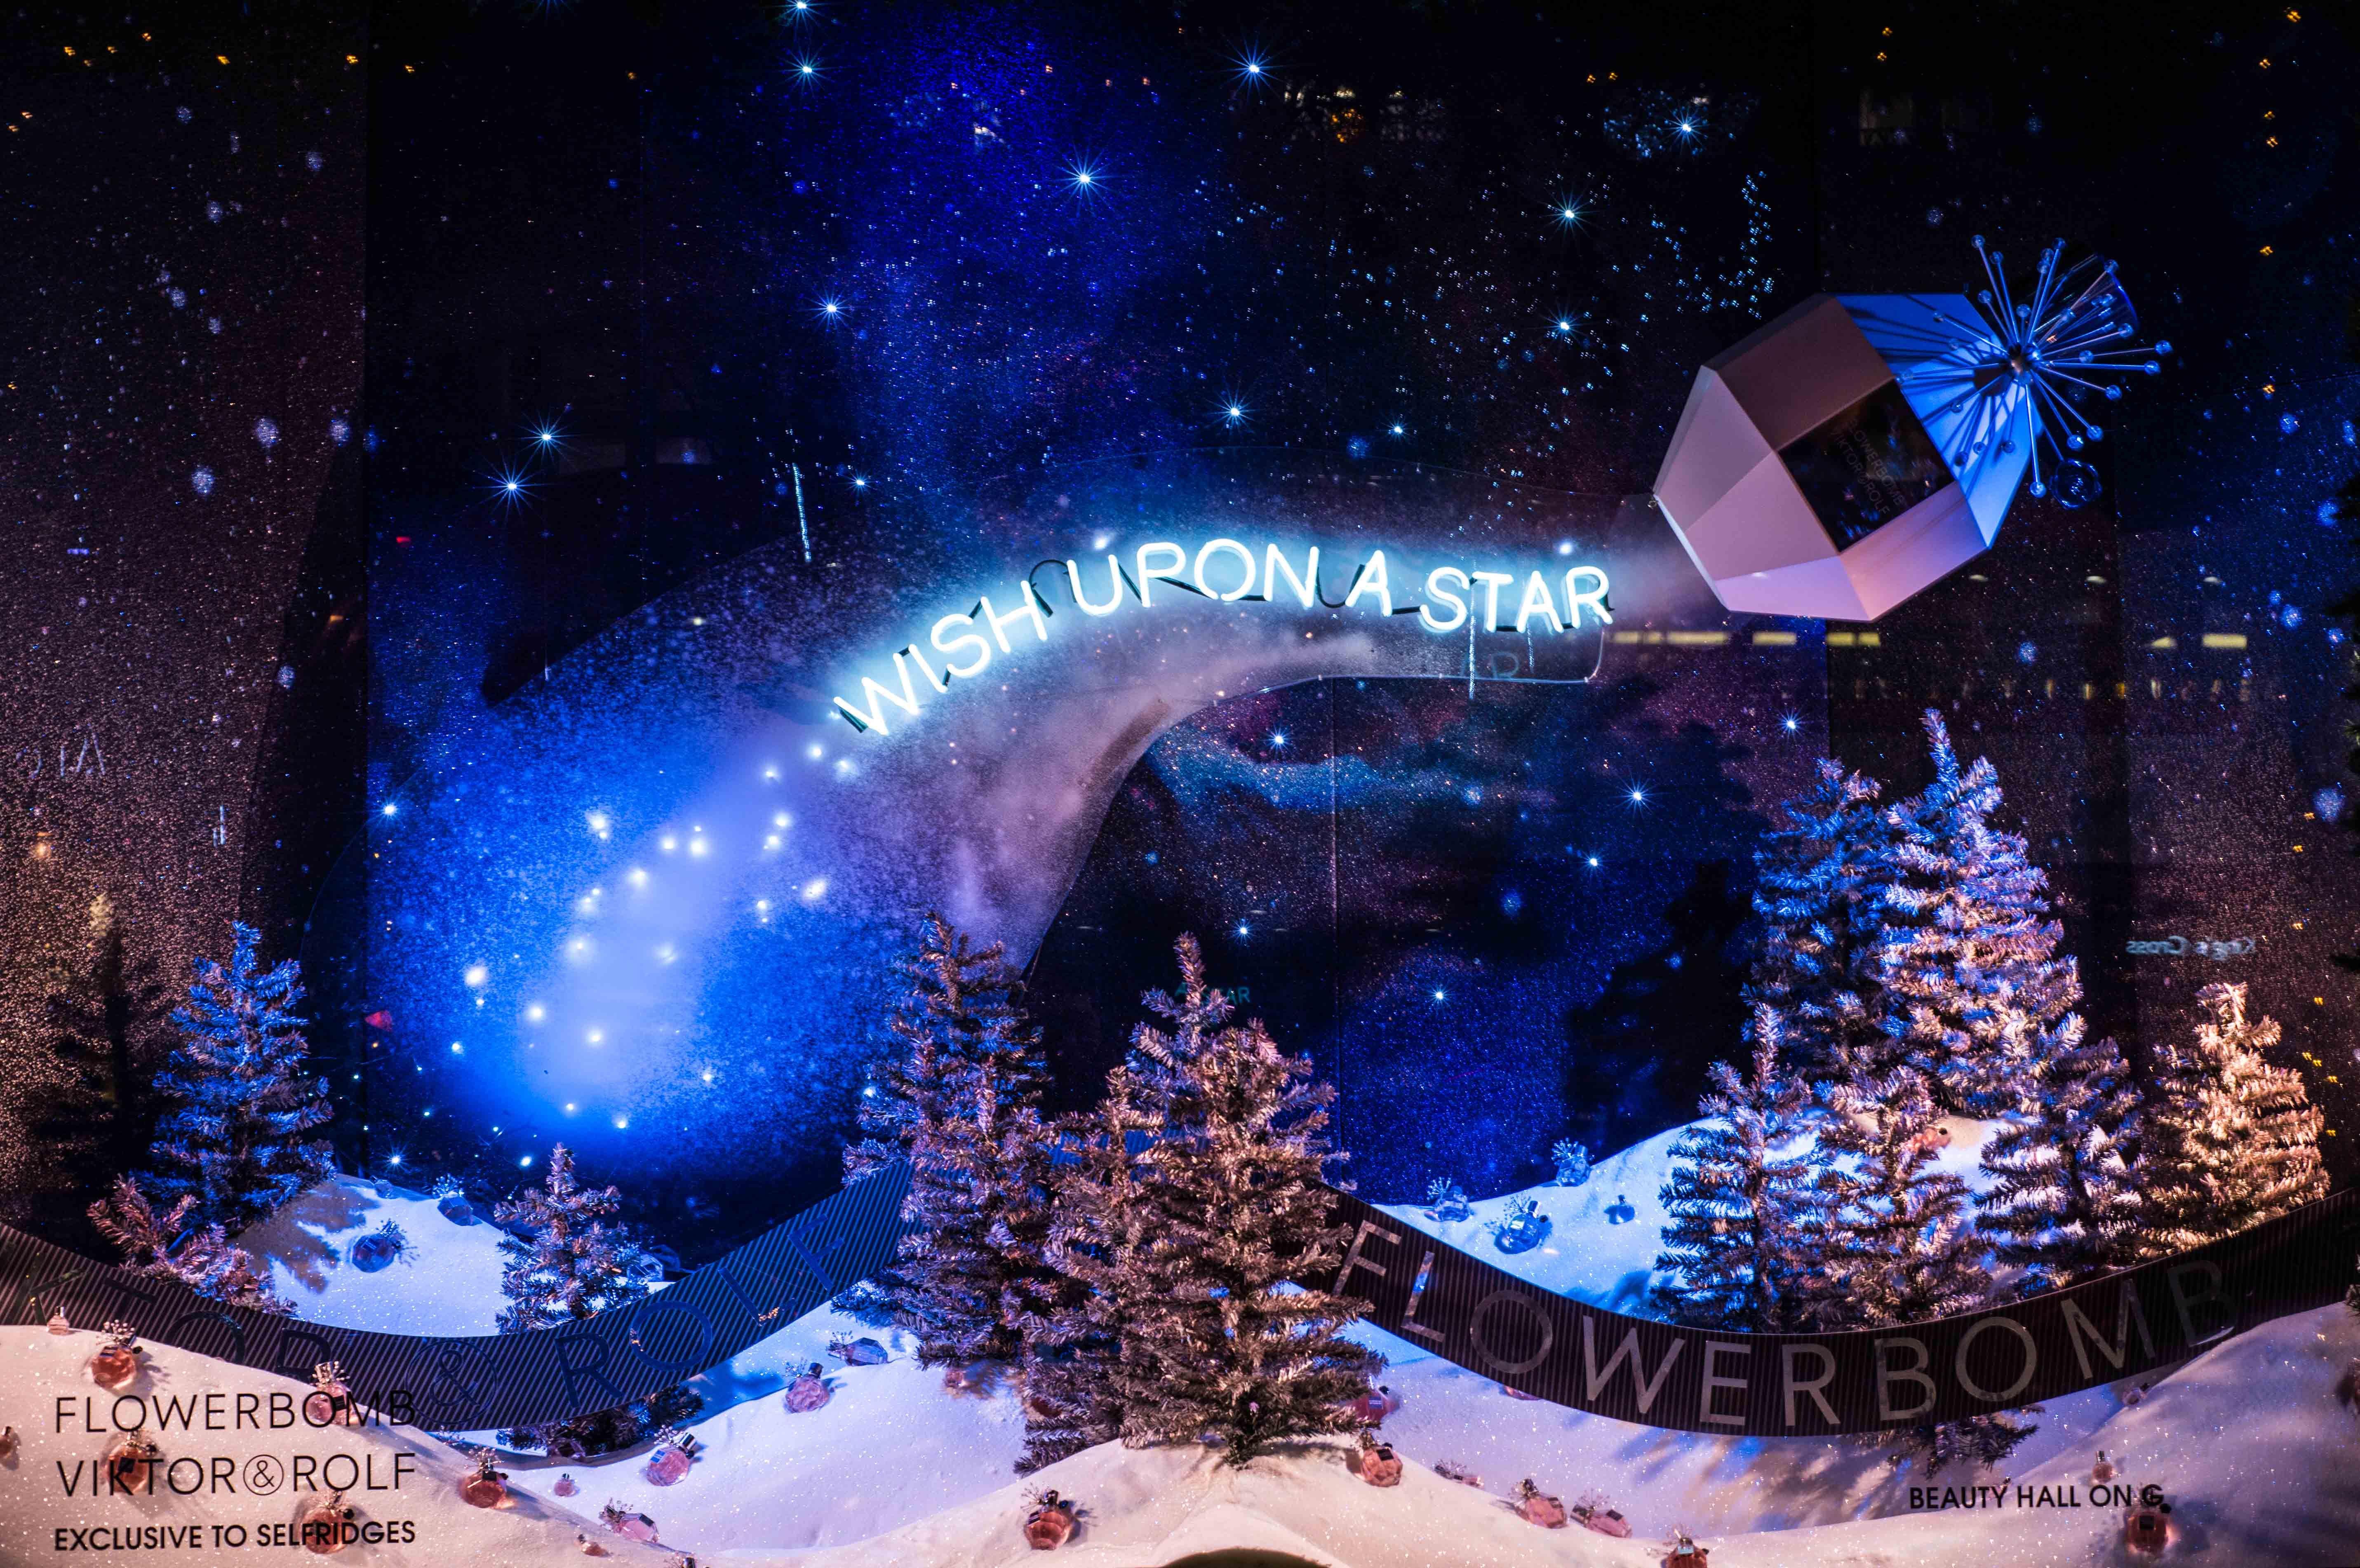 Wish Upon A Star Christmas Window Display For Flowerbomb By Viktor And Rolf Selfridges Desi Christmas Window Display Store Window Displays Christmas Window